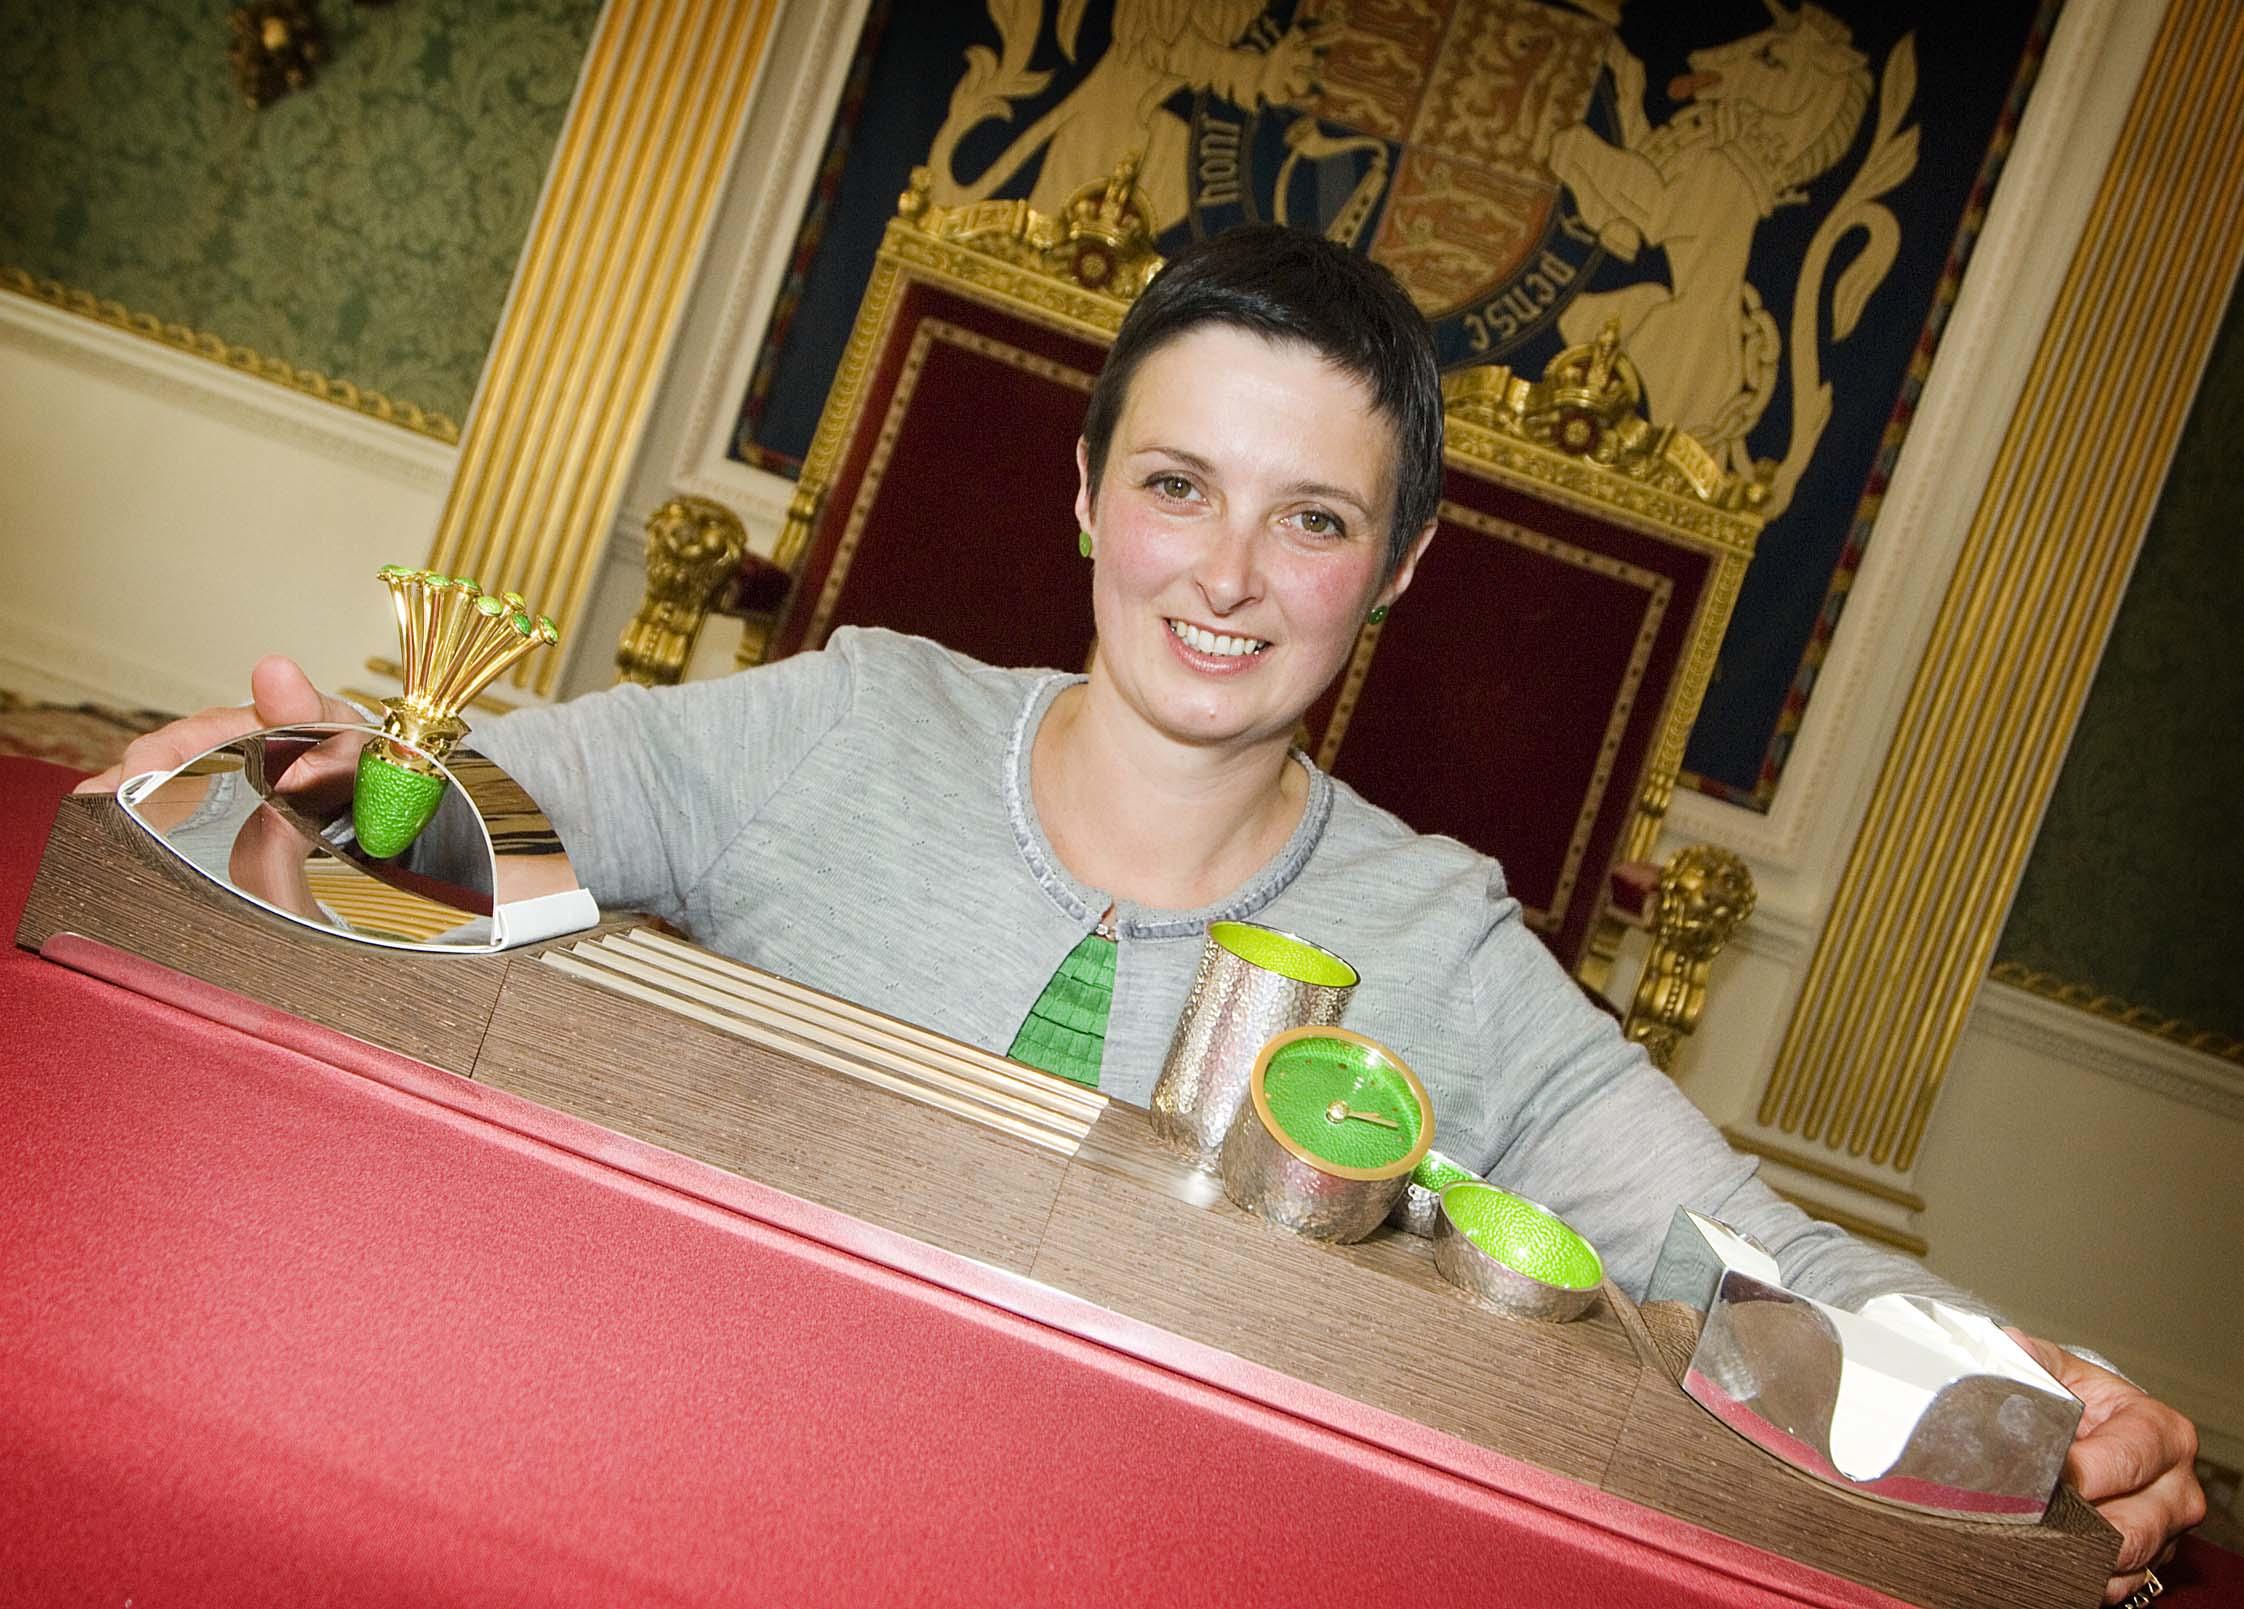 Cara's work set to adorn PM's desk at Number Ten